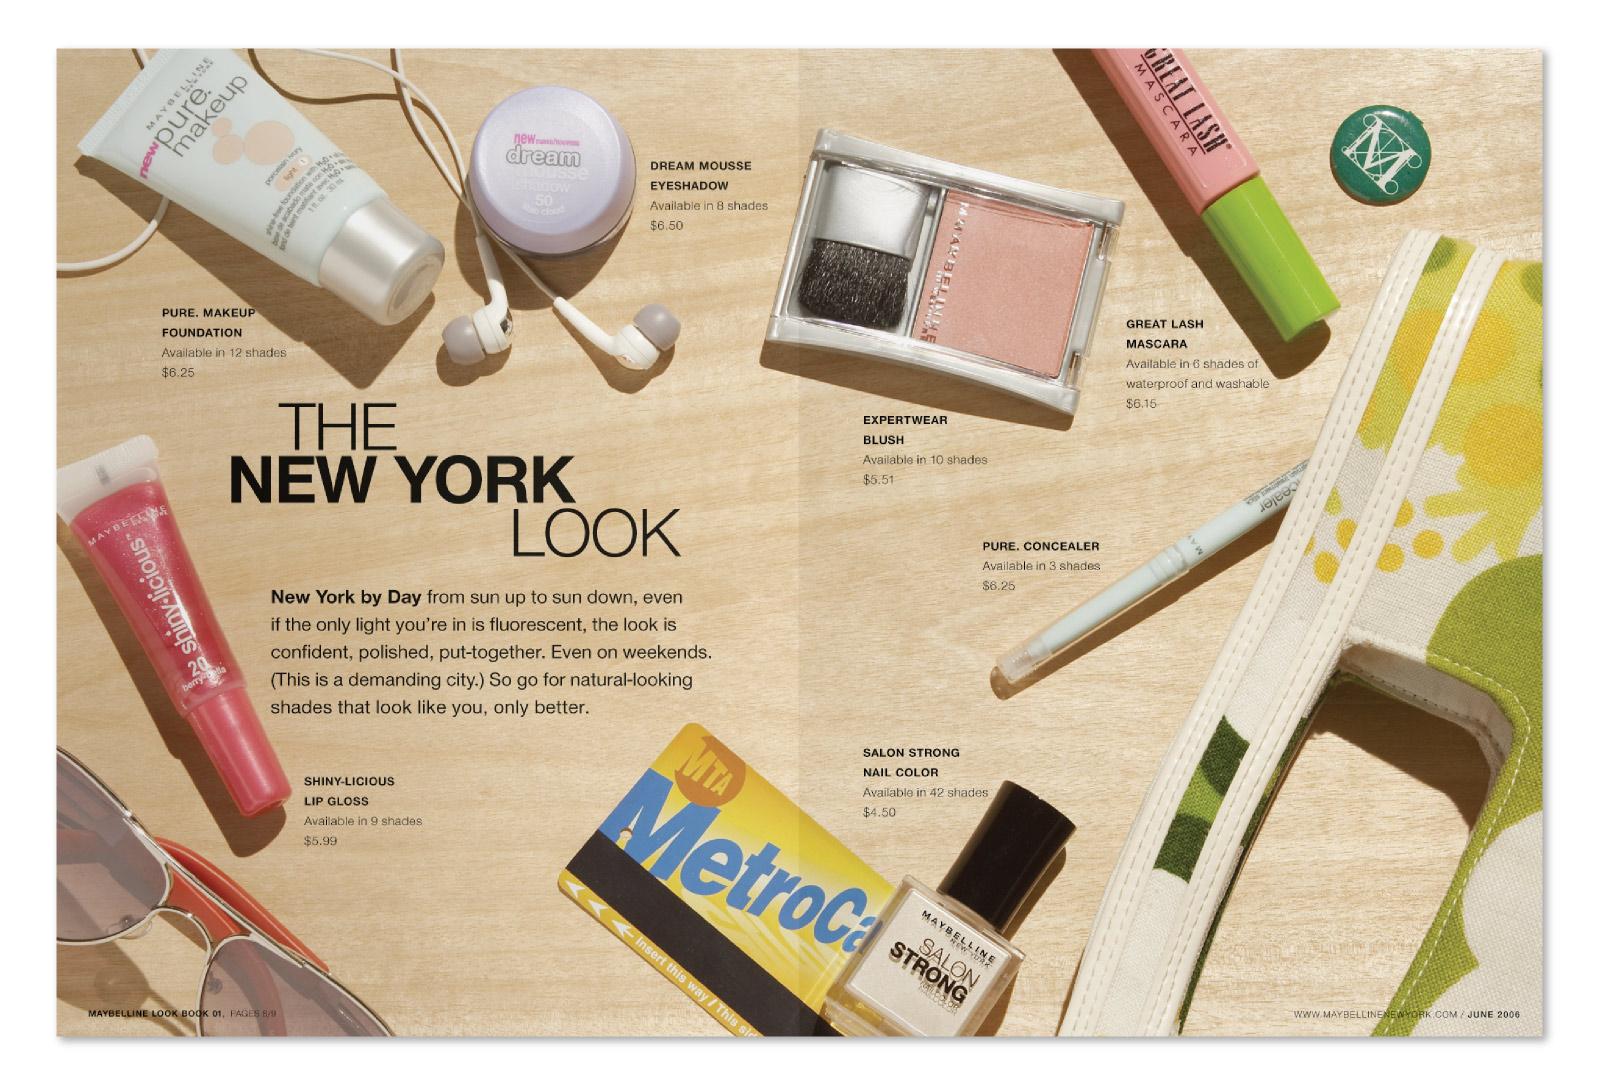 Maybelline-Lookbook-Spread-1